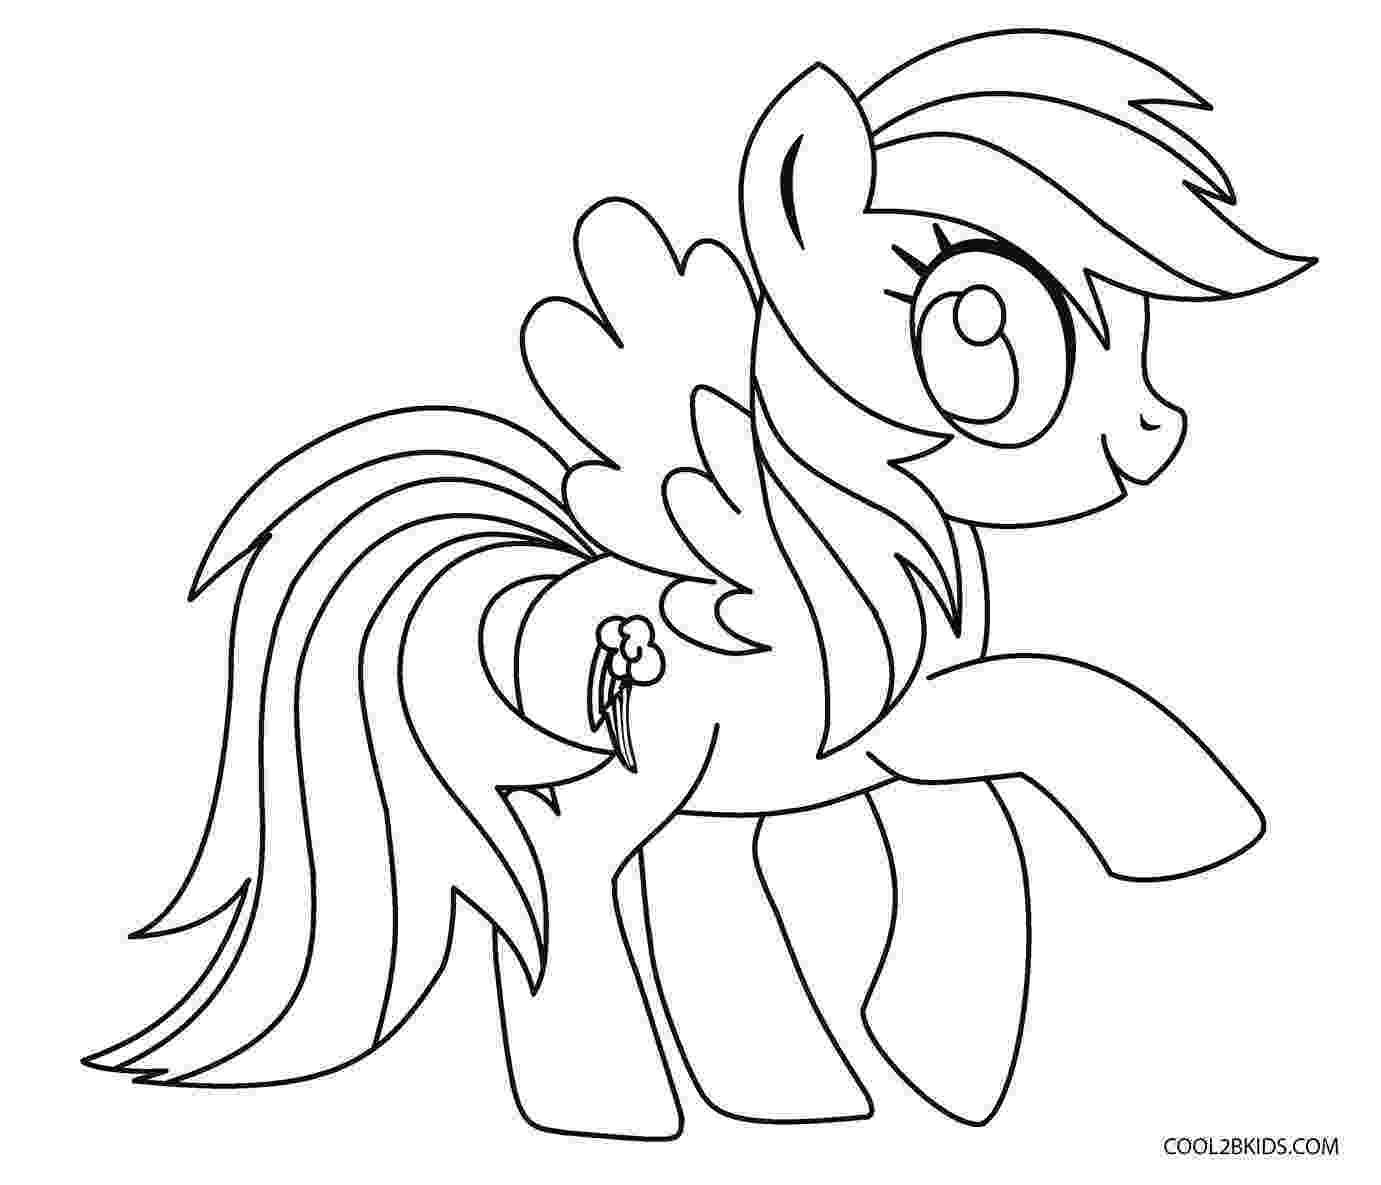 little pony to color princess celestia coloring pages best coloring pages for pony color to little